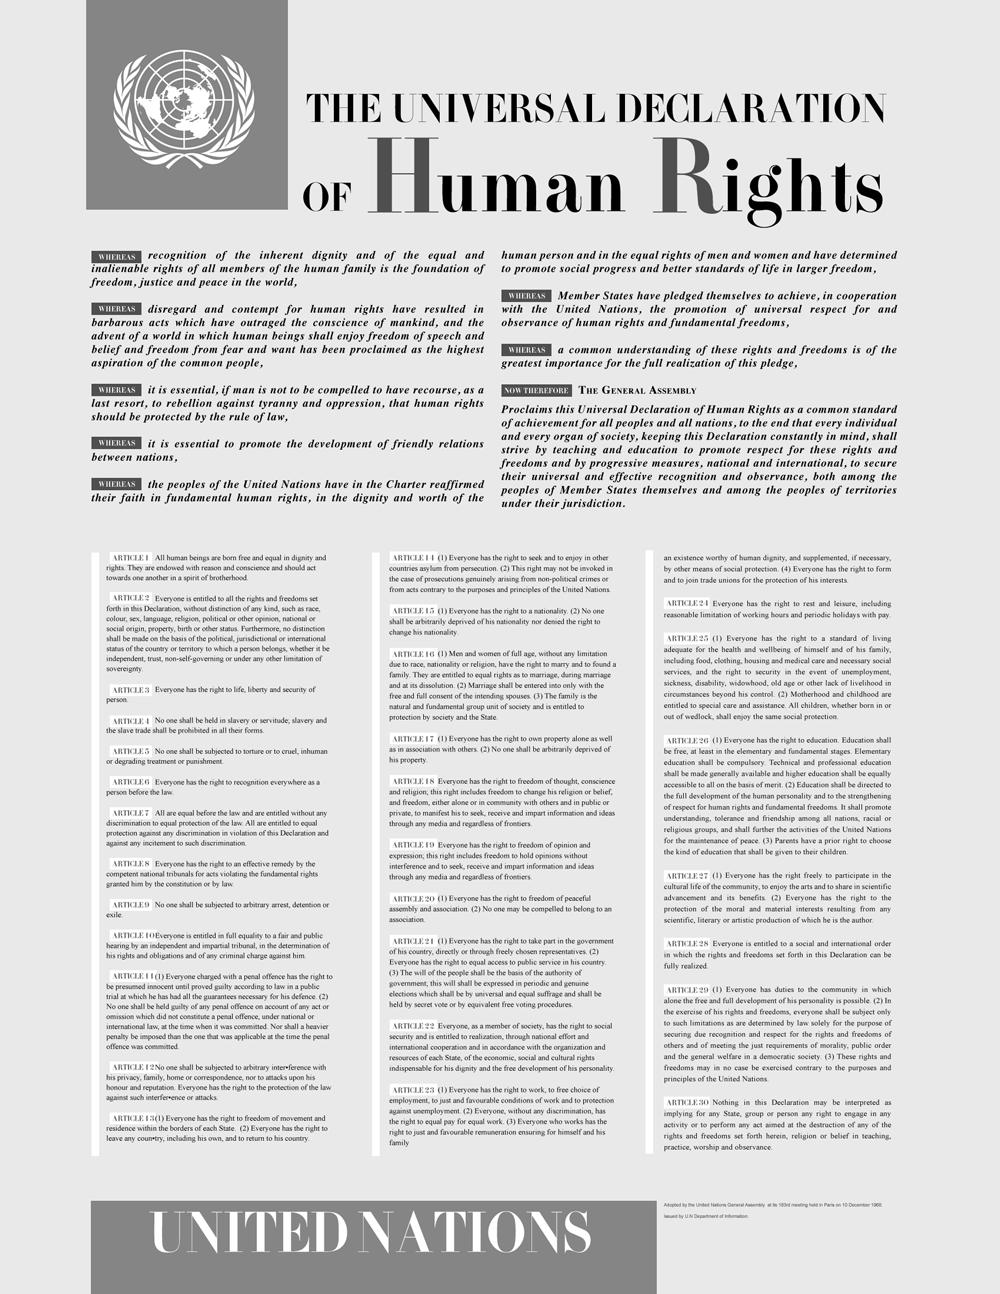 004 Thematic Essay On Human Rights Universaldeclarationofhumanrights Stunning Justice Full